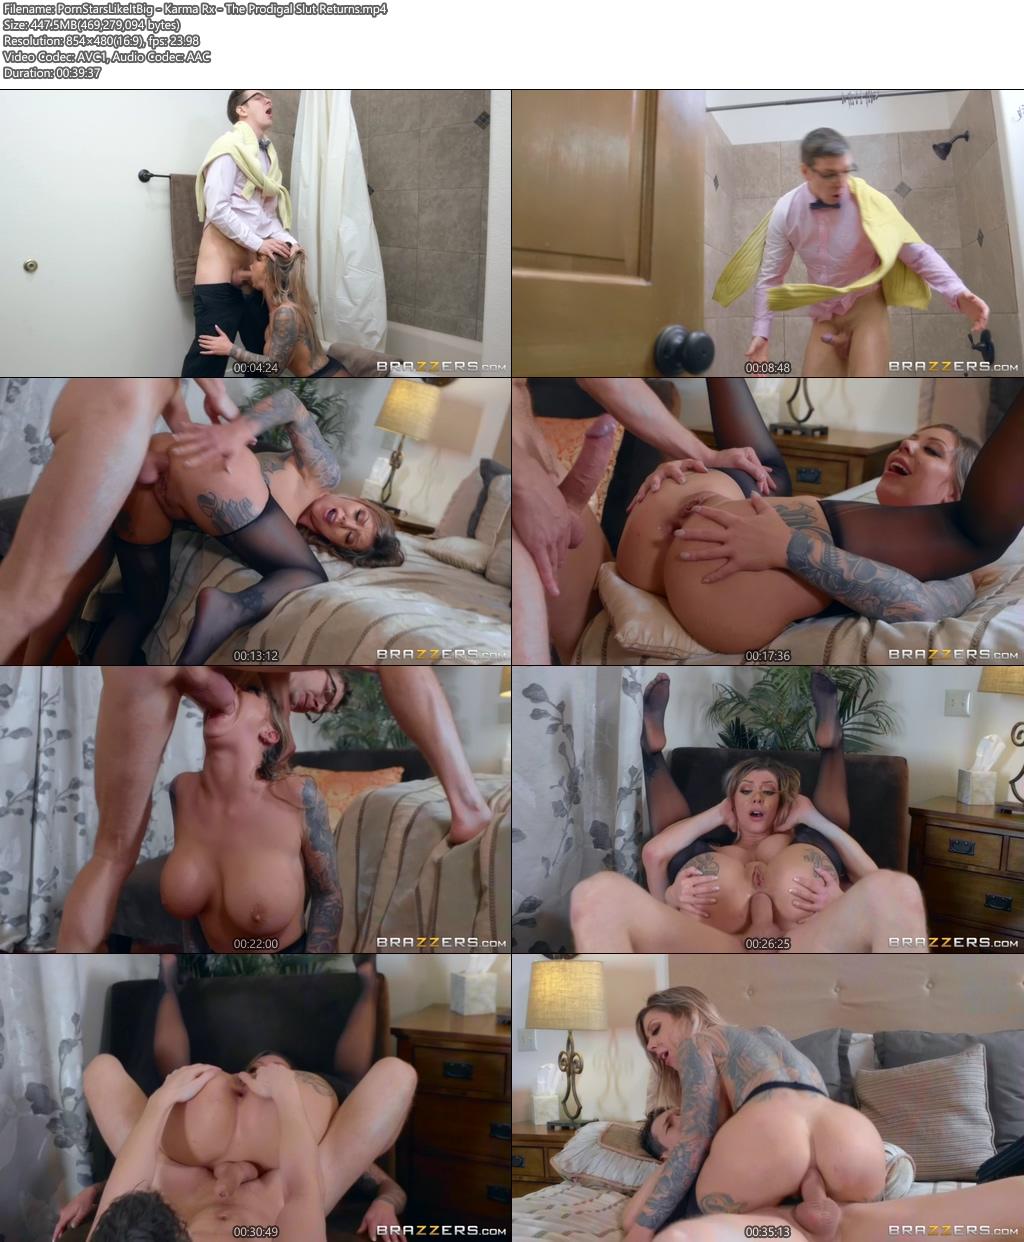 [18+] PornStarsLikeItBig - Karma Rx 2019 Sex Video - The Prodigal Slut Returns XXX Screenshot